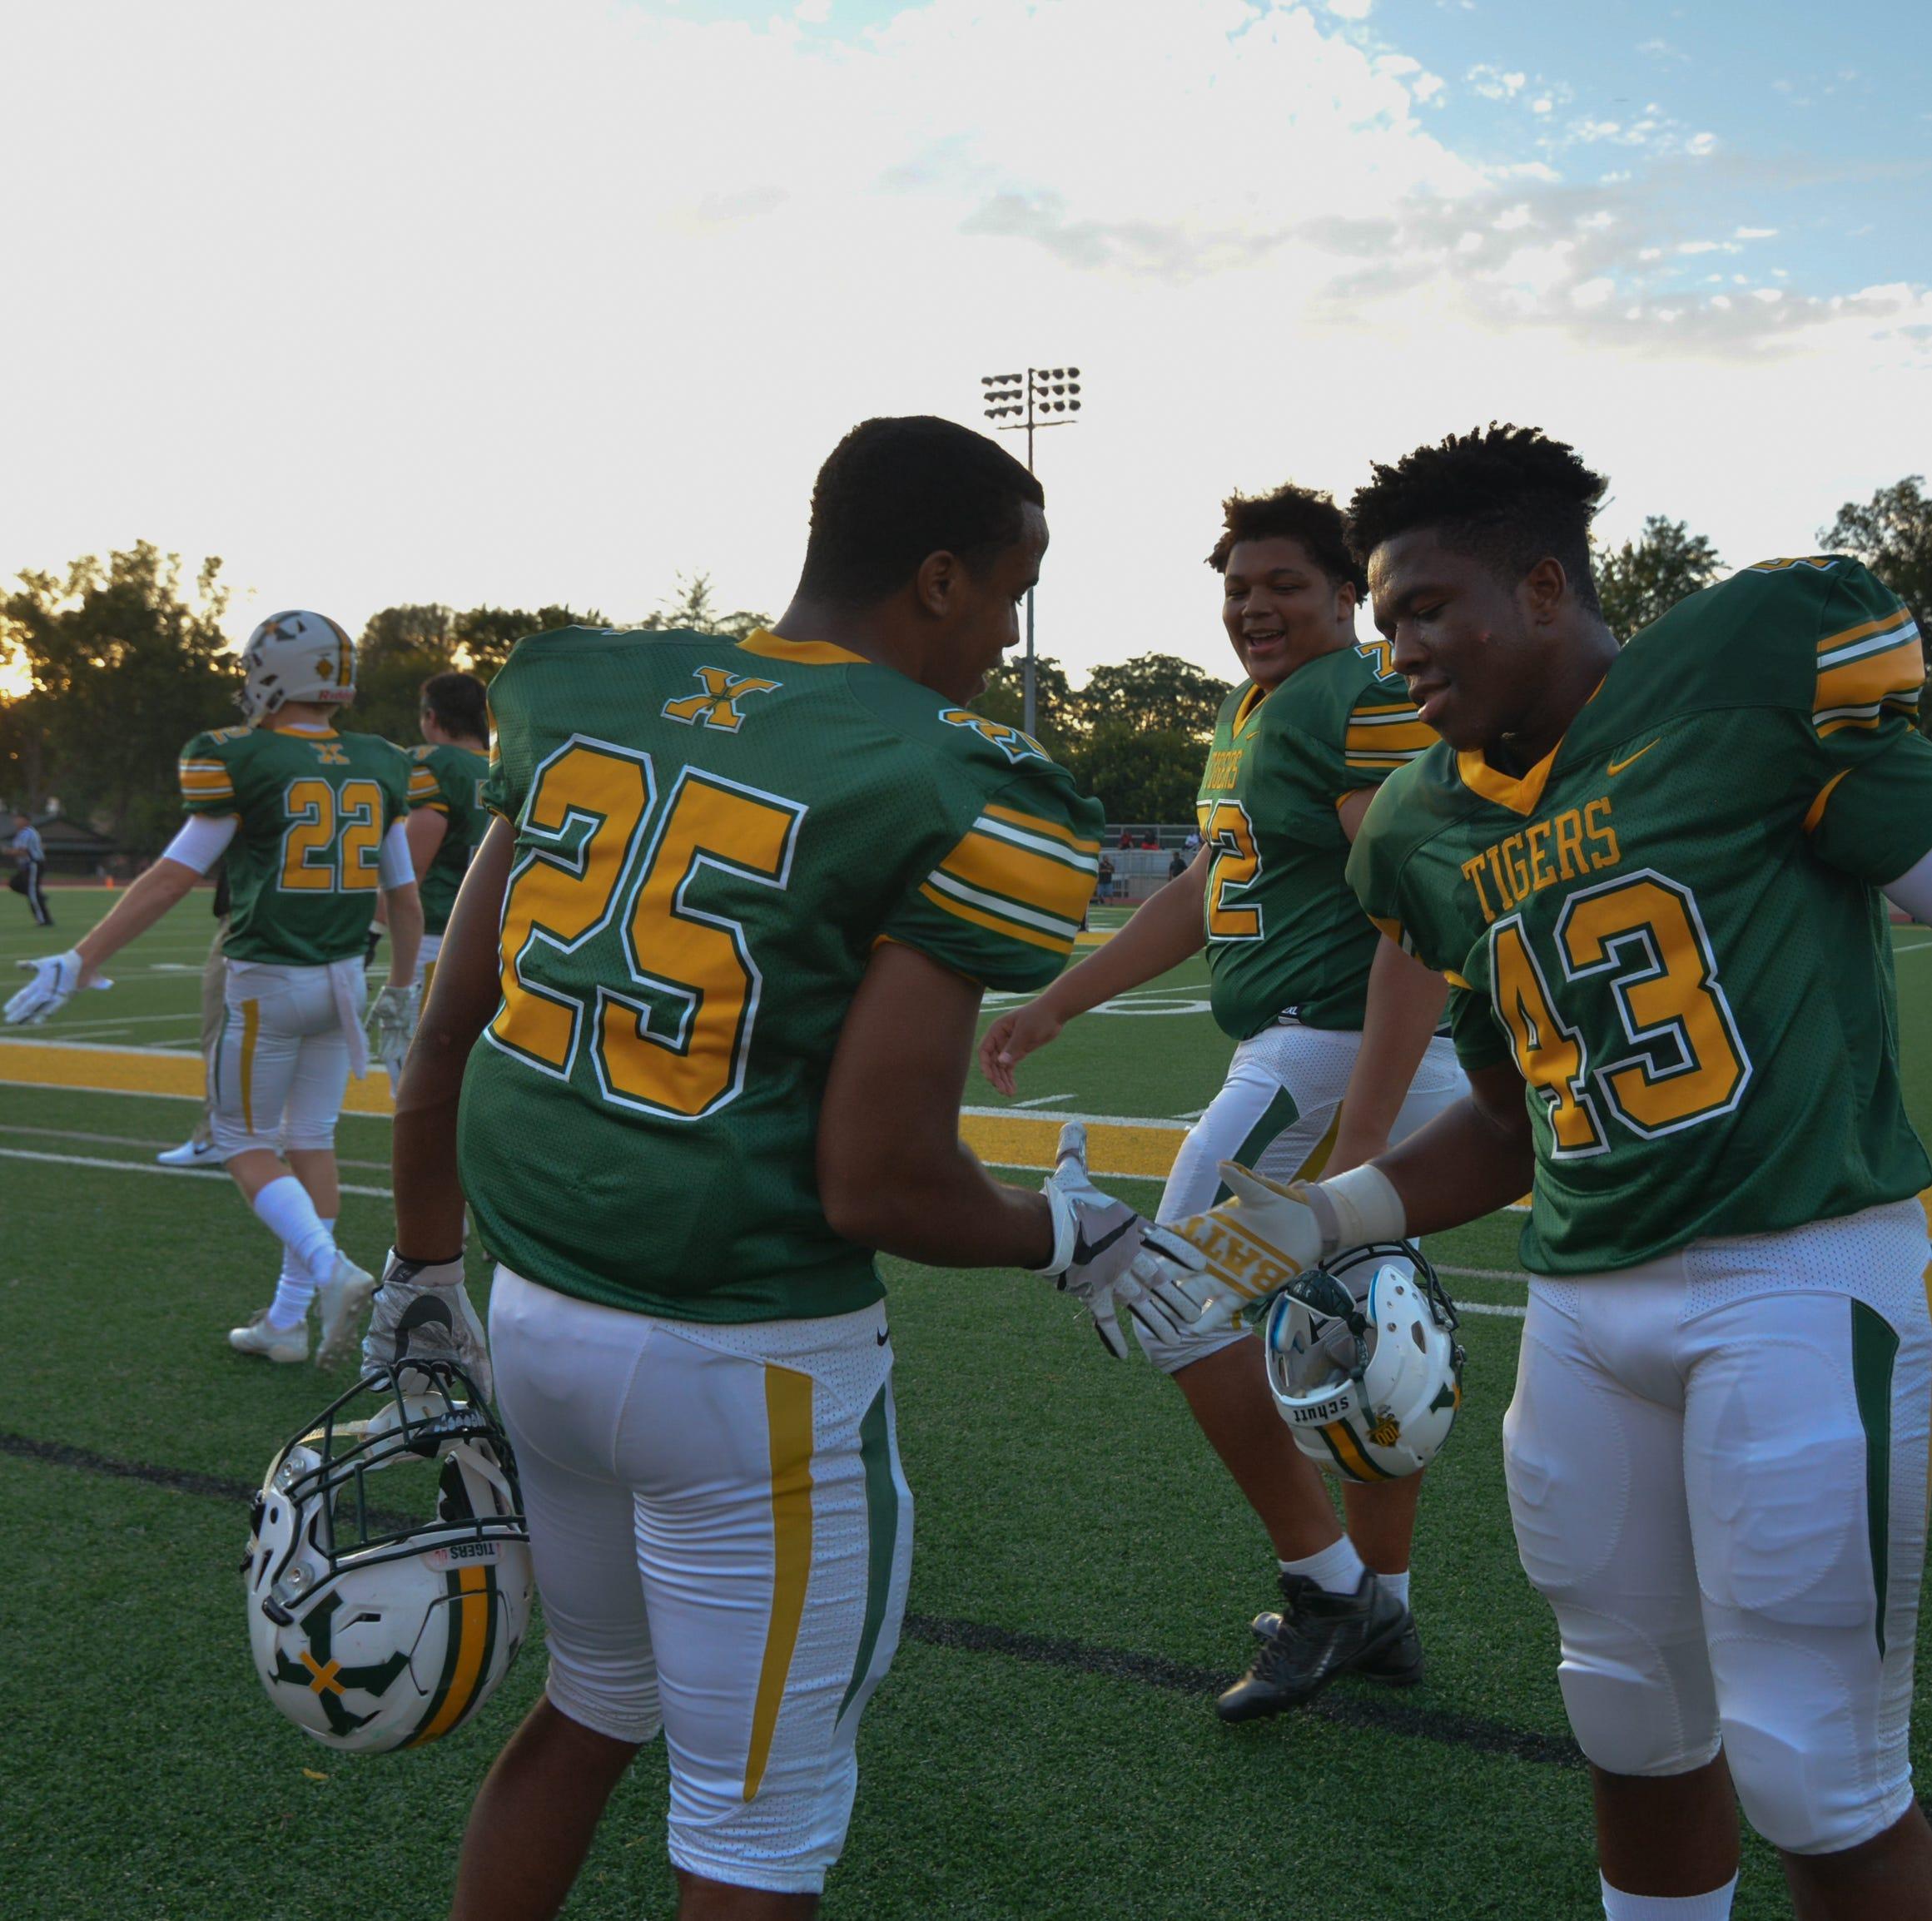 Live updates: Get tonight's high school football scores here!